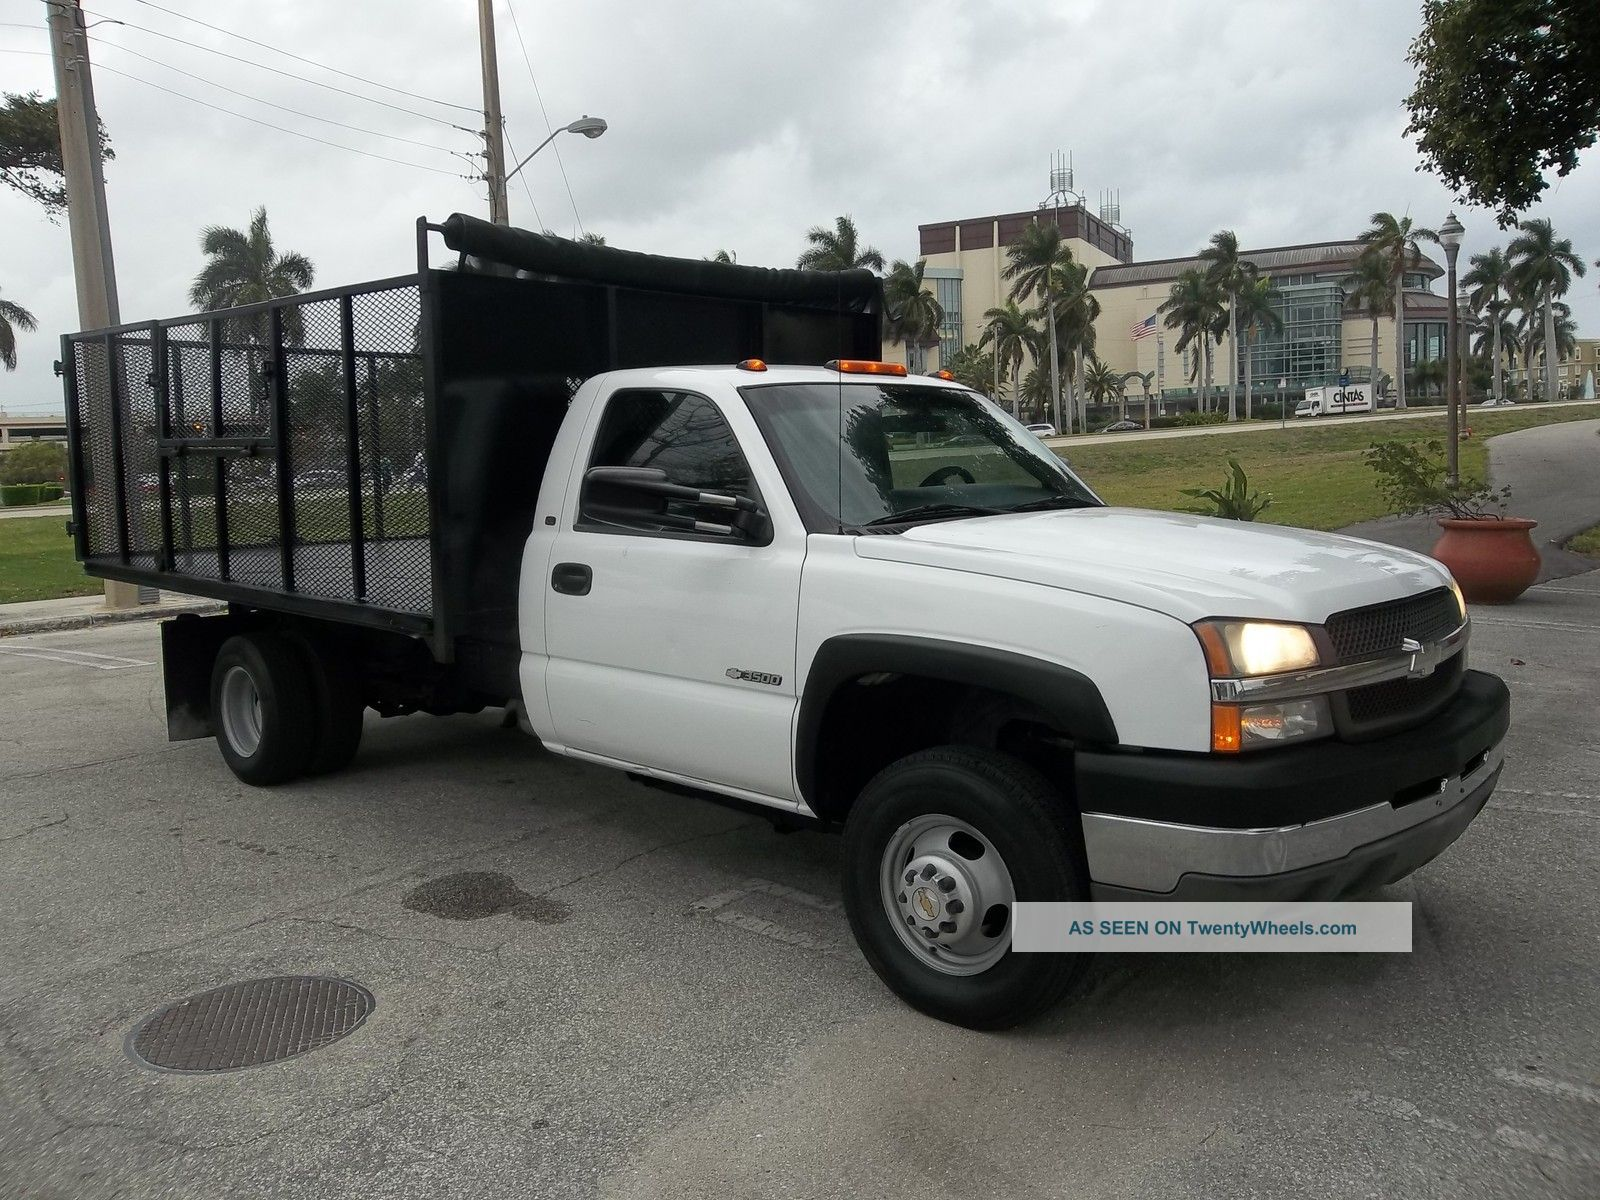 towing capacity of a chevy 3500 hd dually wheels autos weblog. Black Bedroom Furniture Sets. Home Design Ideas